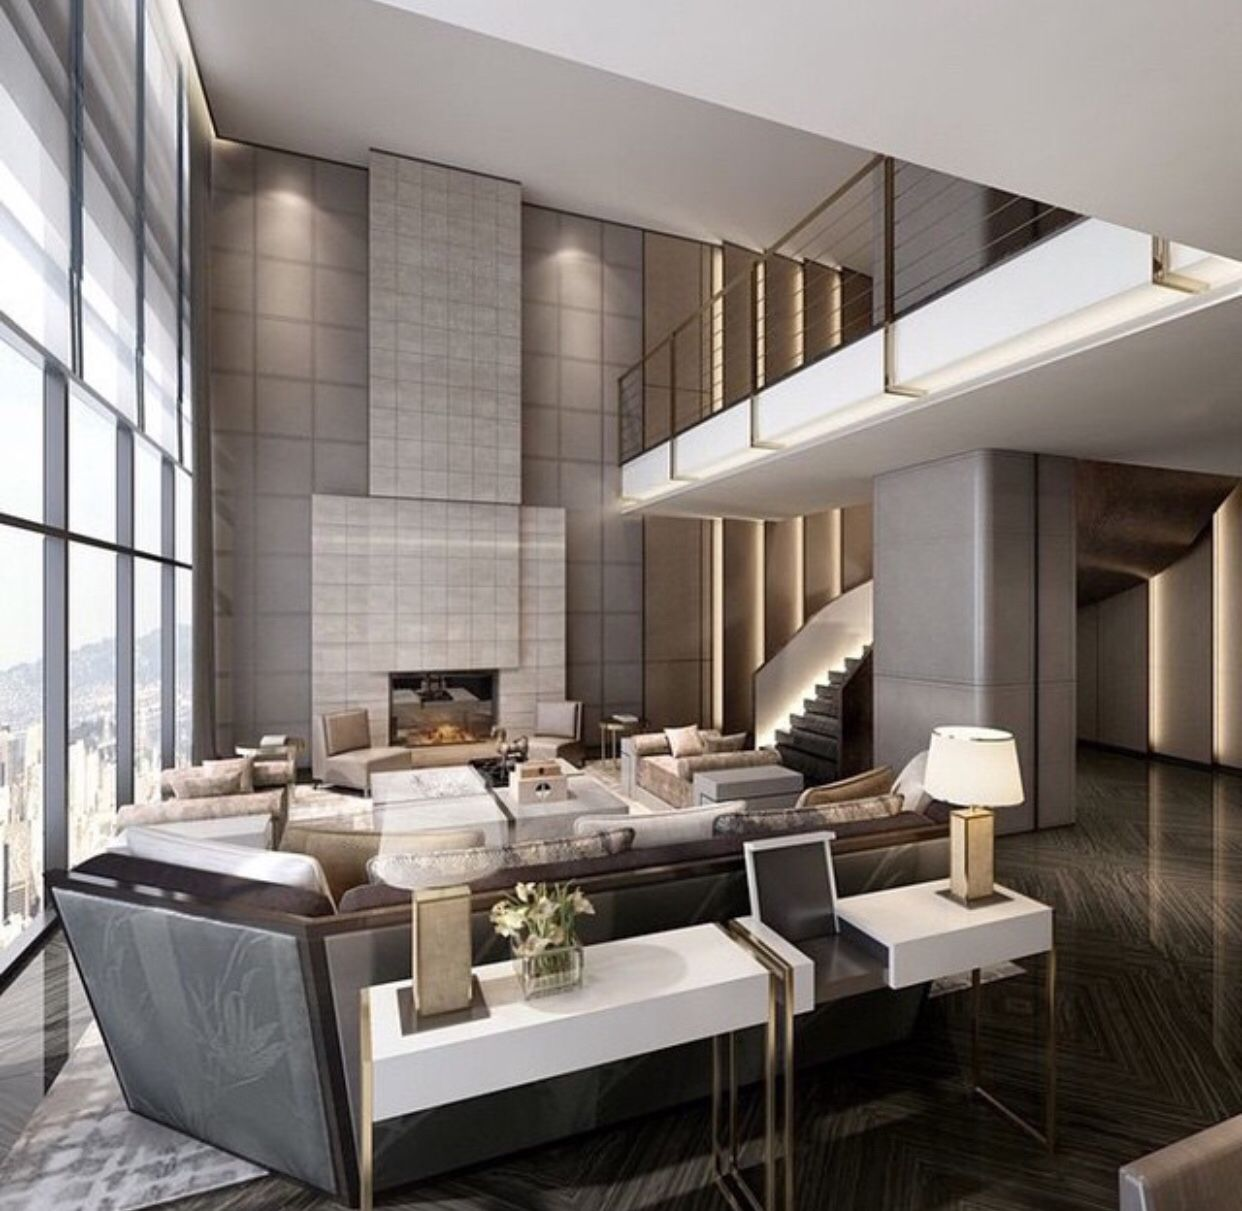 High ceiling design pinterest high ceilings living for High ceiling interior